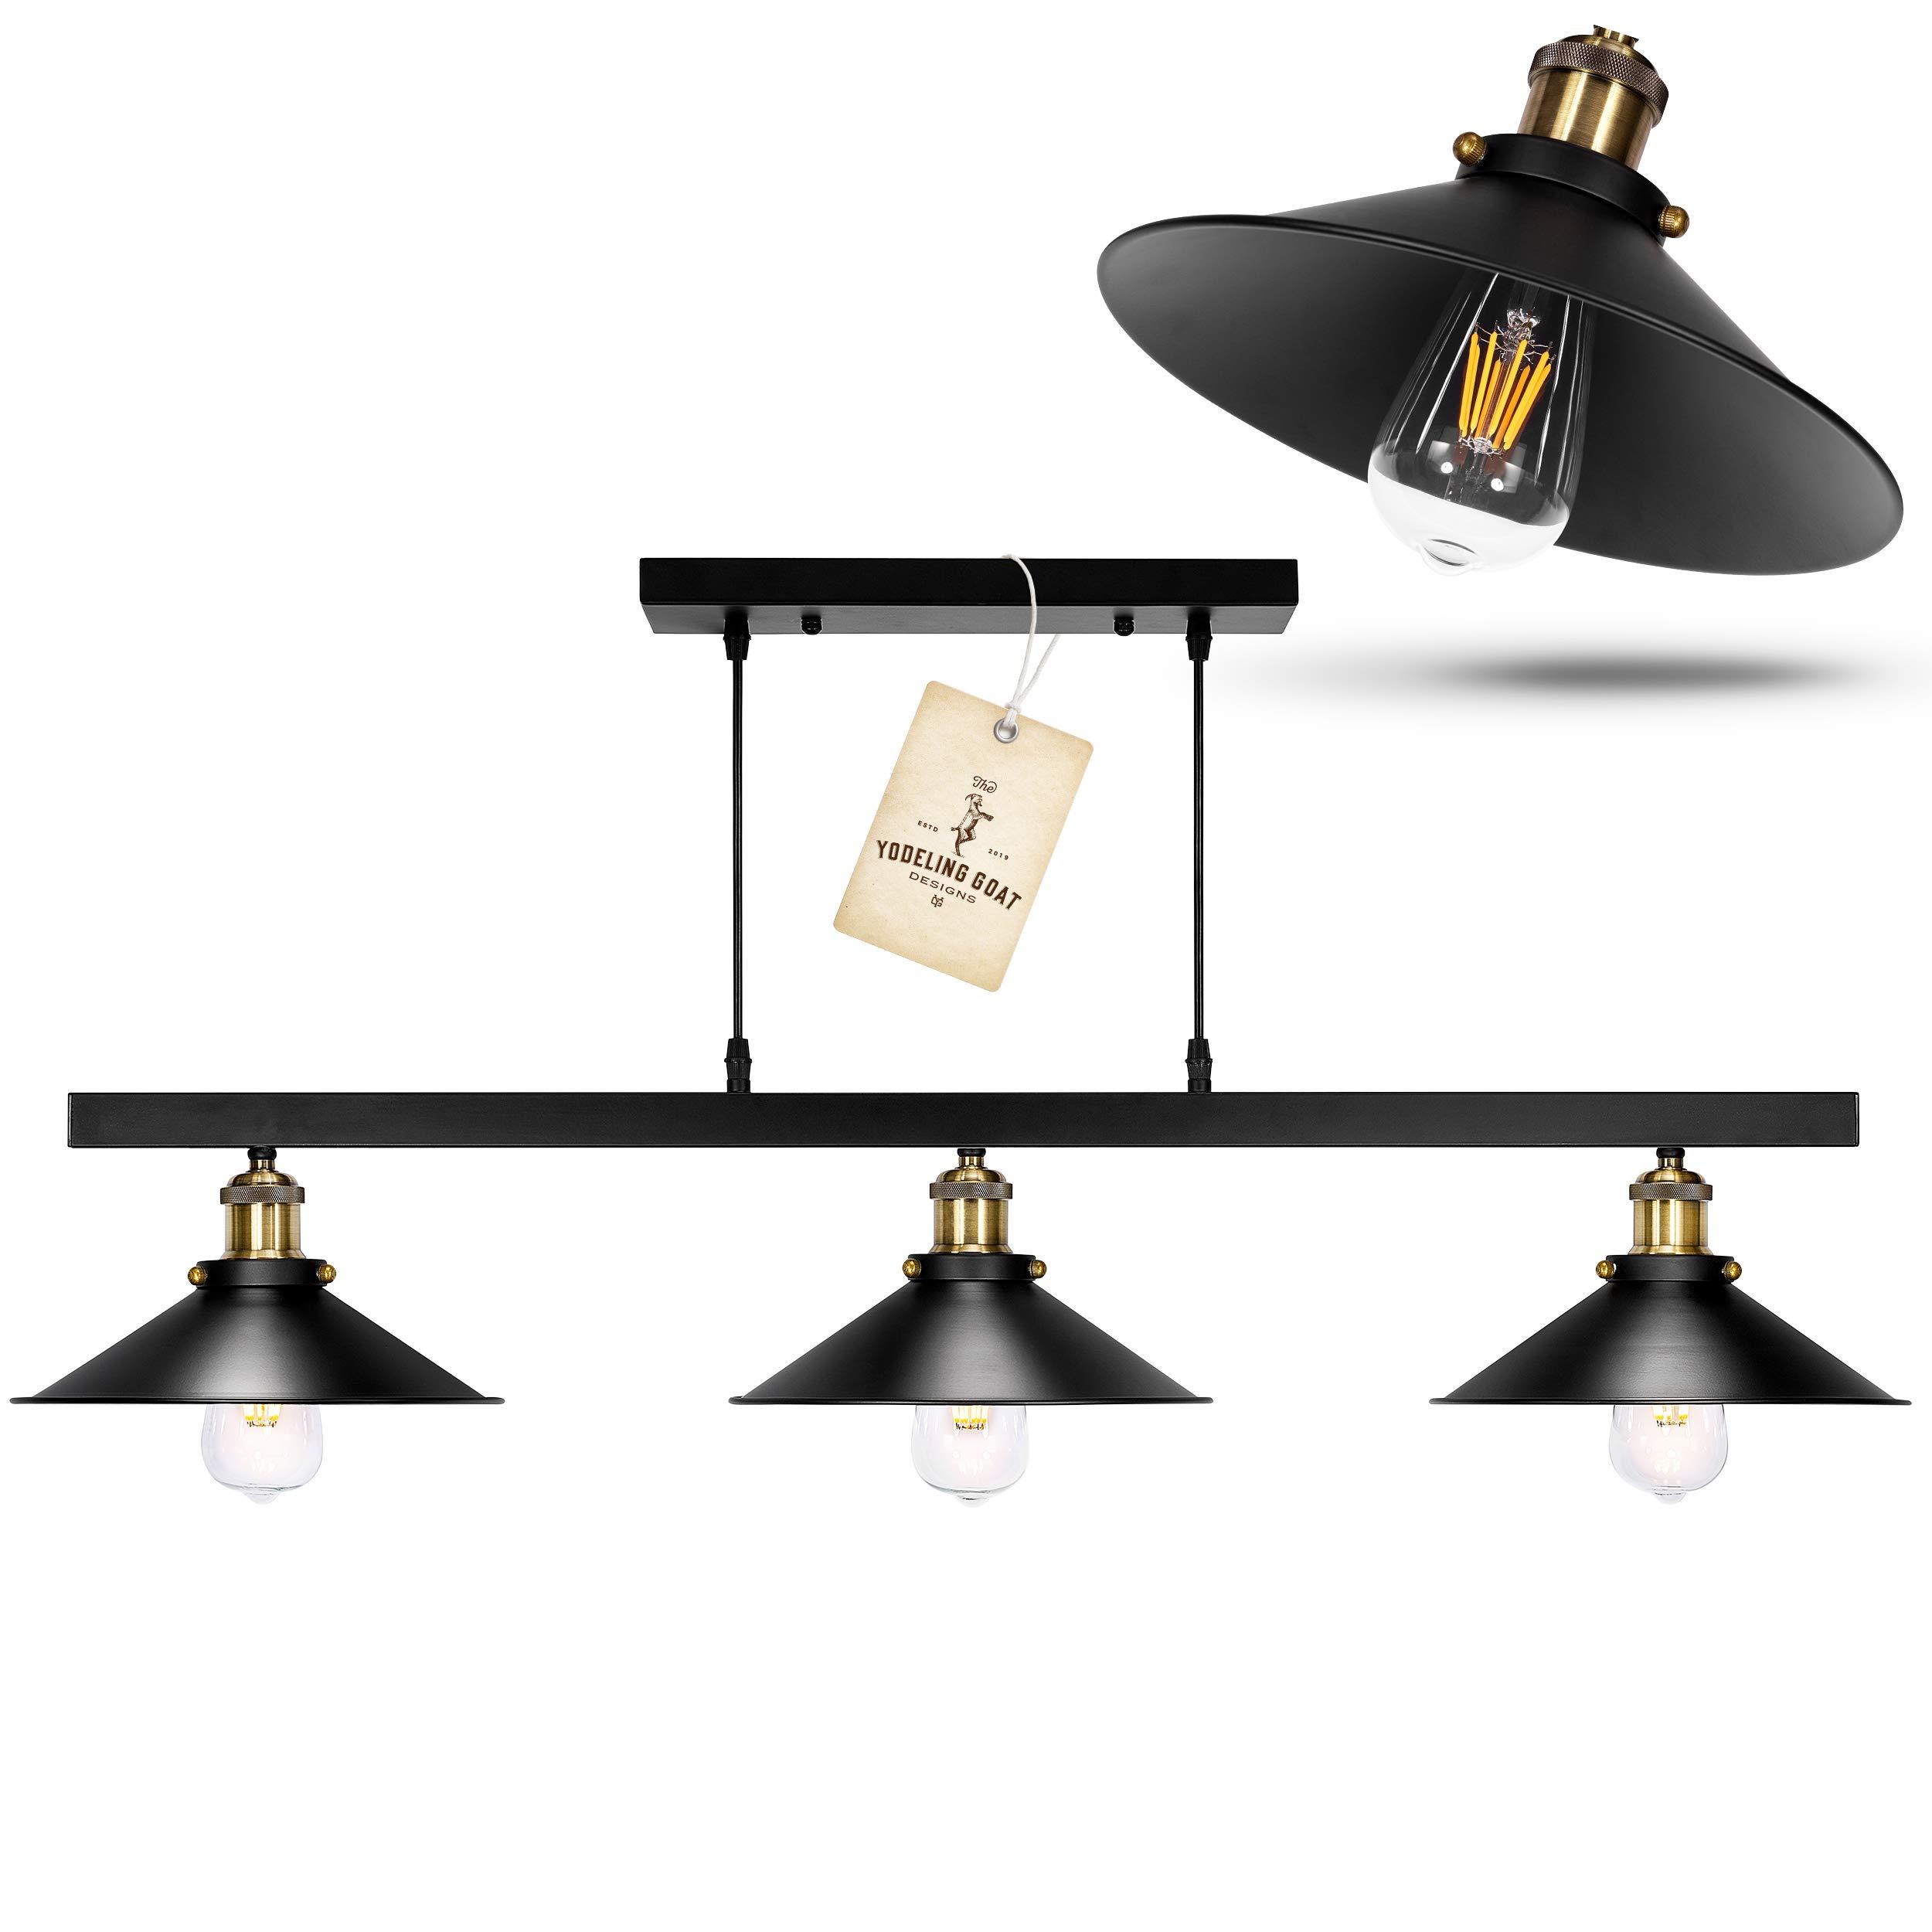 Black Rustic Chandelier - Hanging Light Fixture, Pool Table Light, Pendant Farmhouse Lighting for Kitchen Island, Dining Room Lighting Fixtures Hanging, Matte Black & Bronze Farmhouse Chandelier